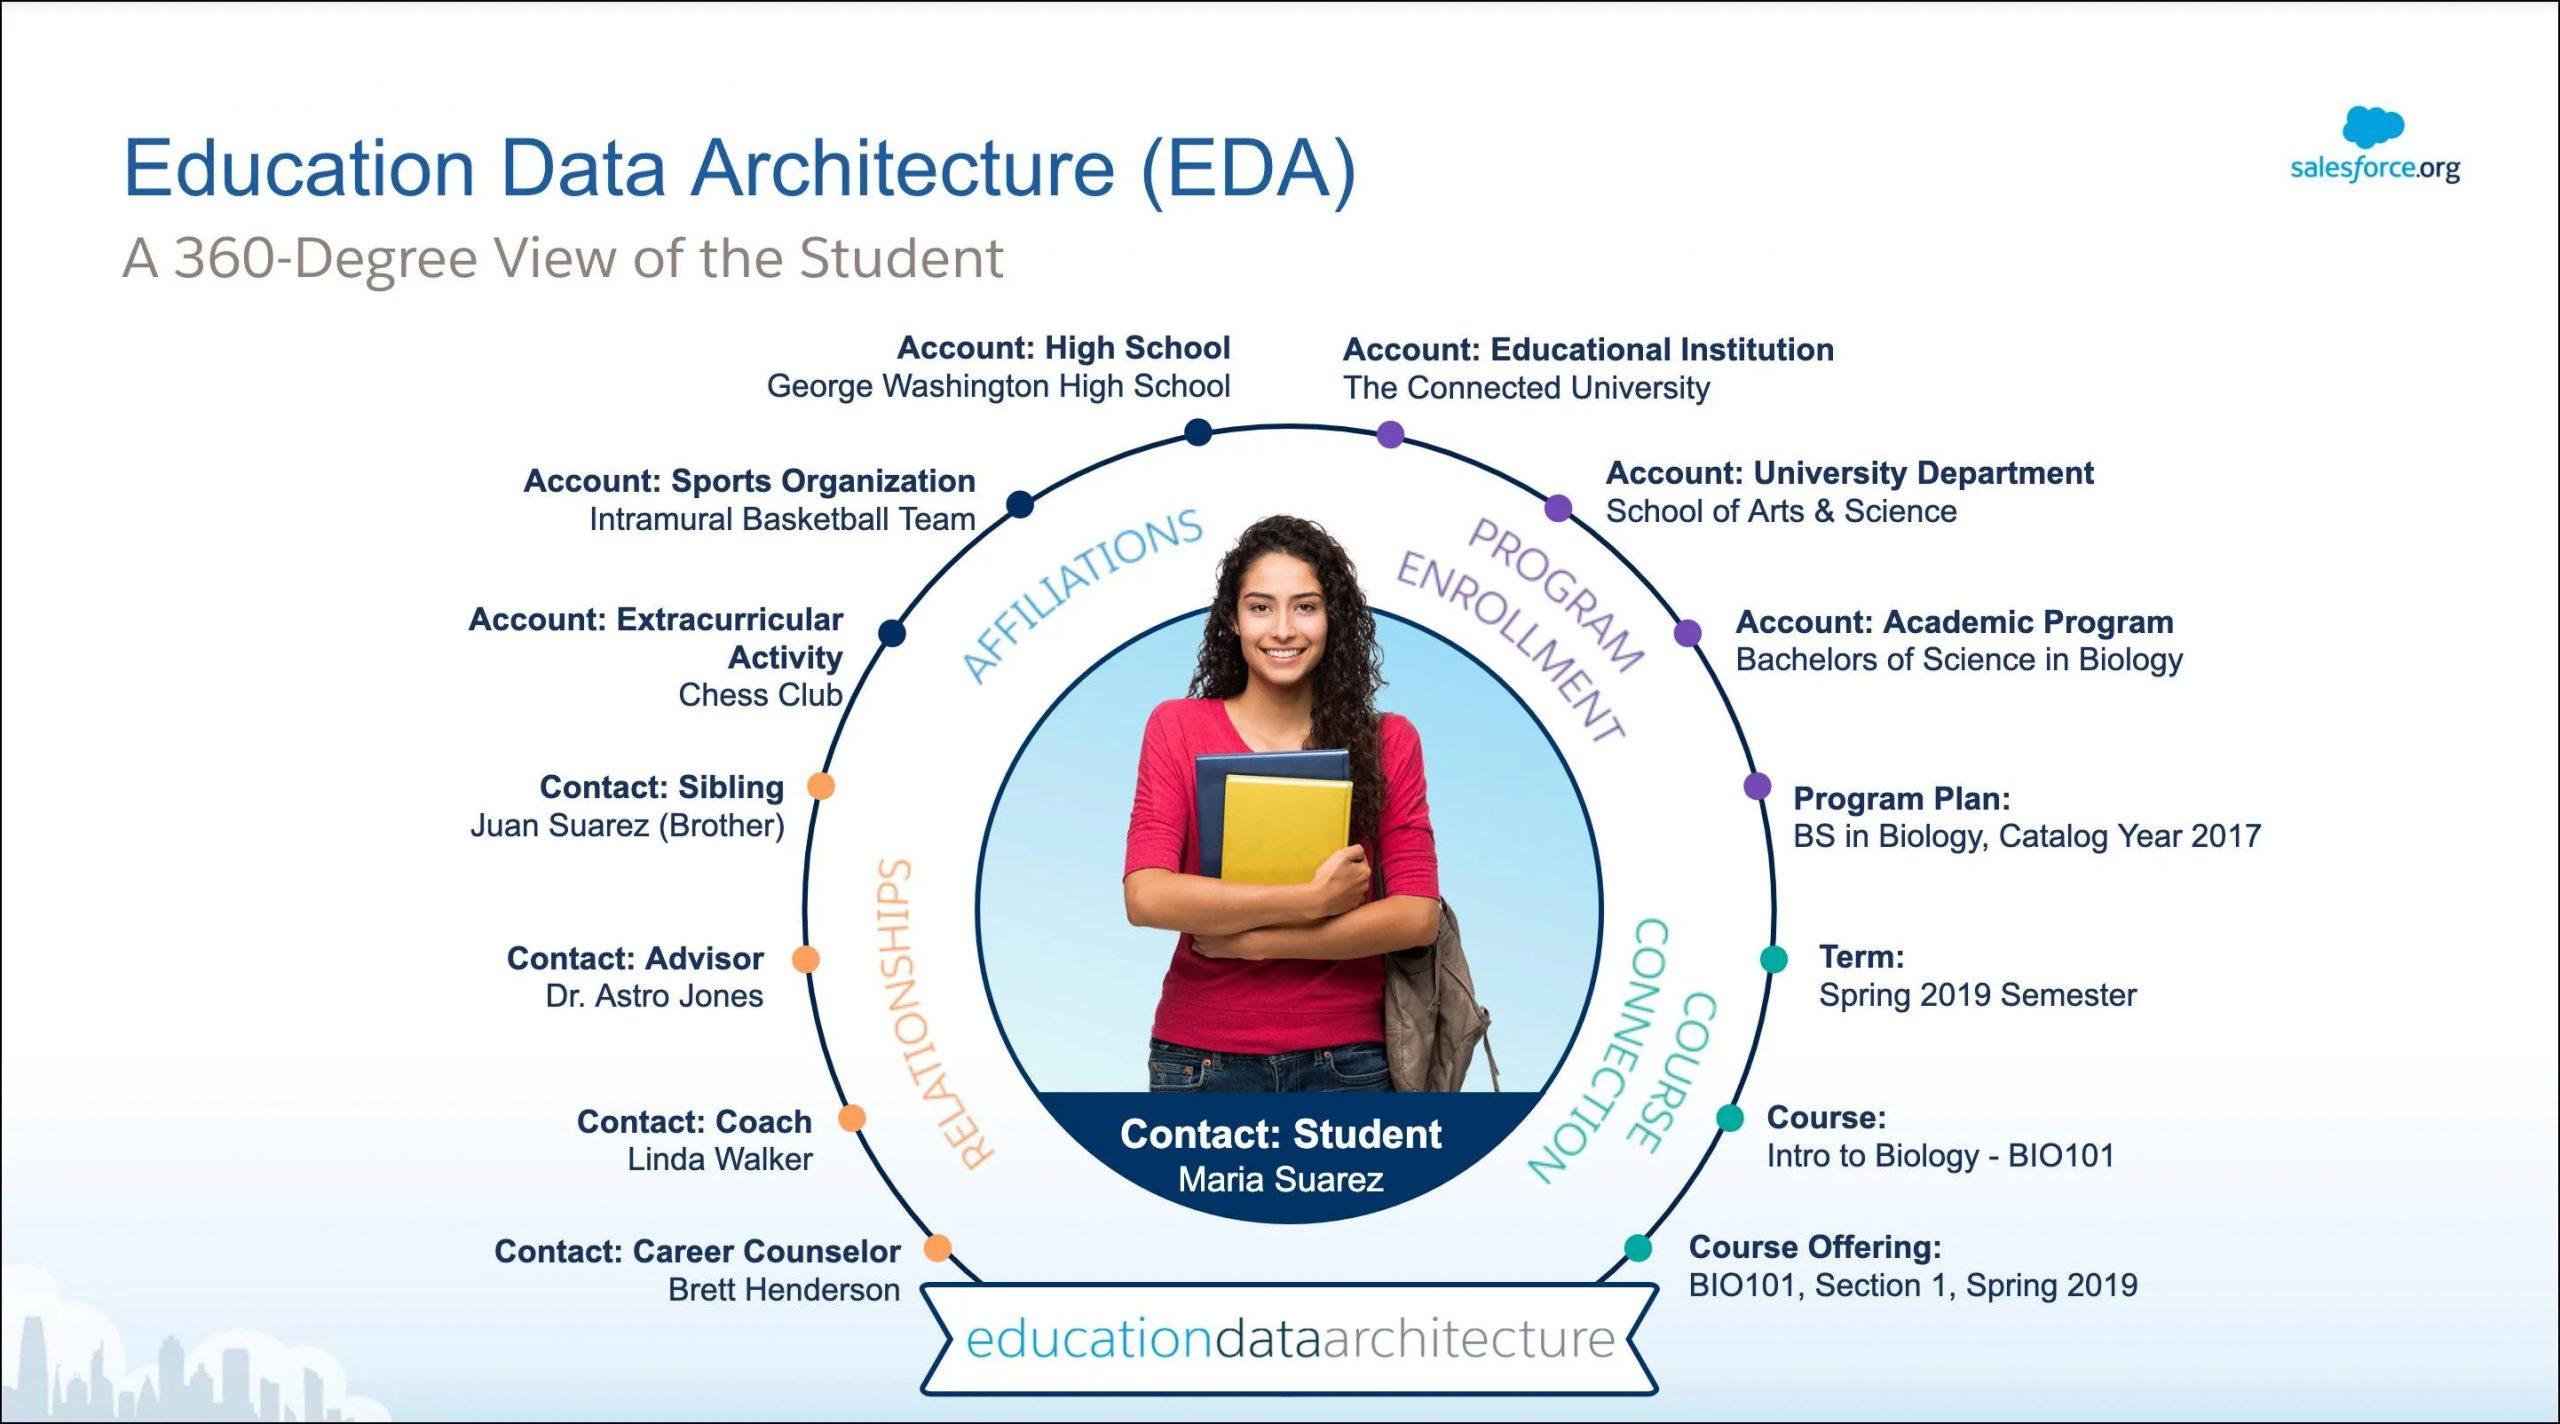 Education Data Architecture